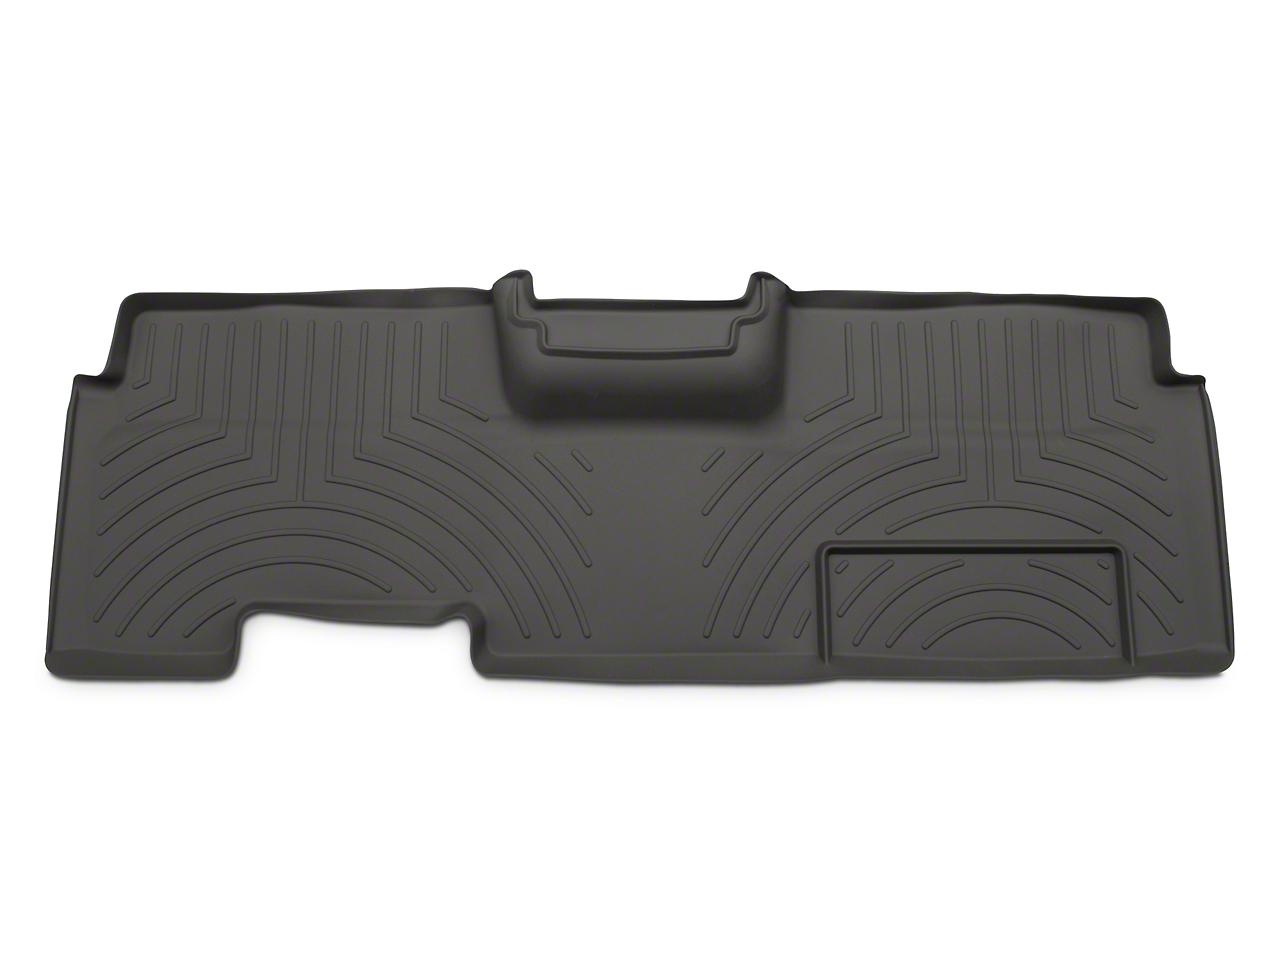 Weathertech DigitalFit Rear Floor Liner - Gray (09-14 F-150 SuperCab, SuperCrew)